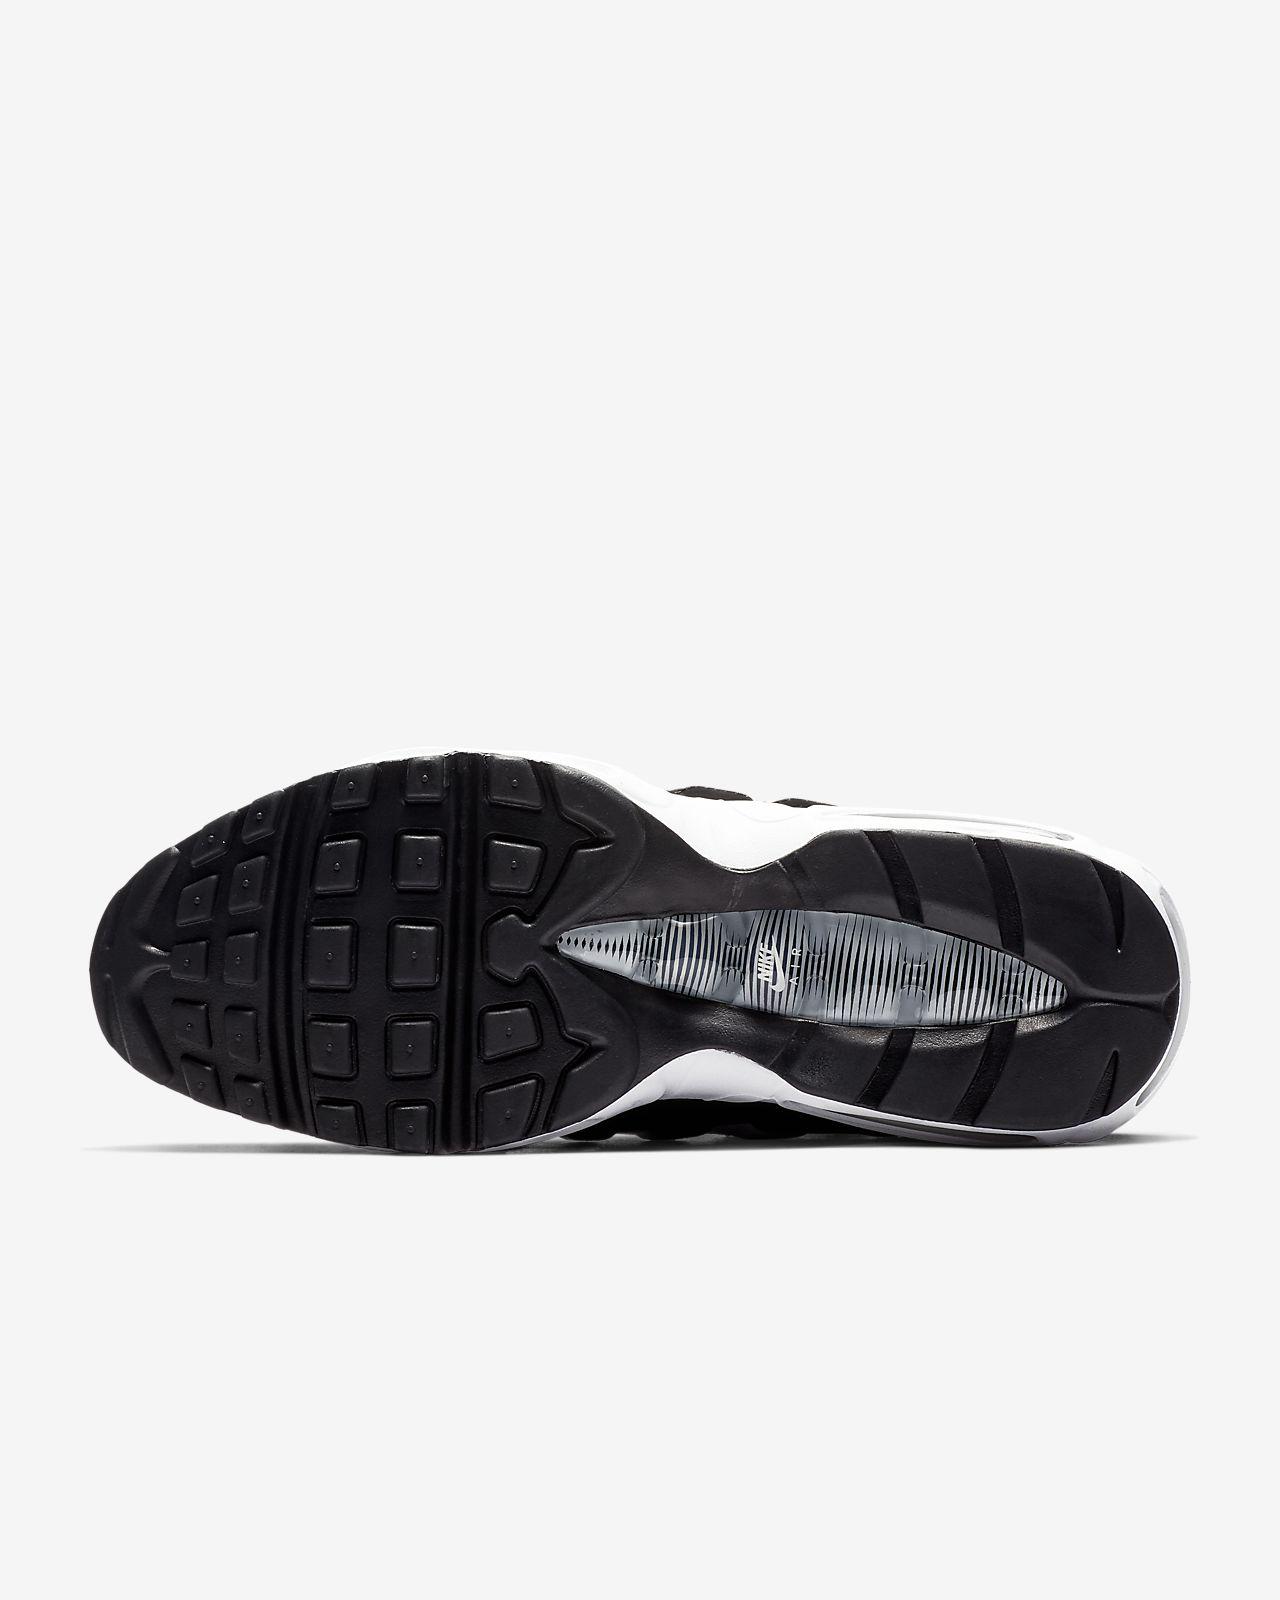 225afcd2a917b Nike Air Max 95 Essential Men's Shoe. Nike.com ID